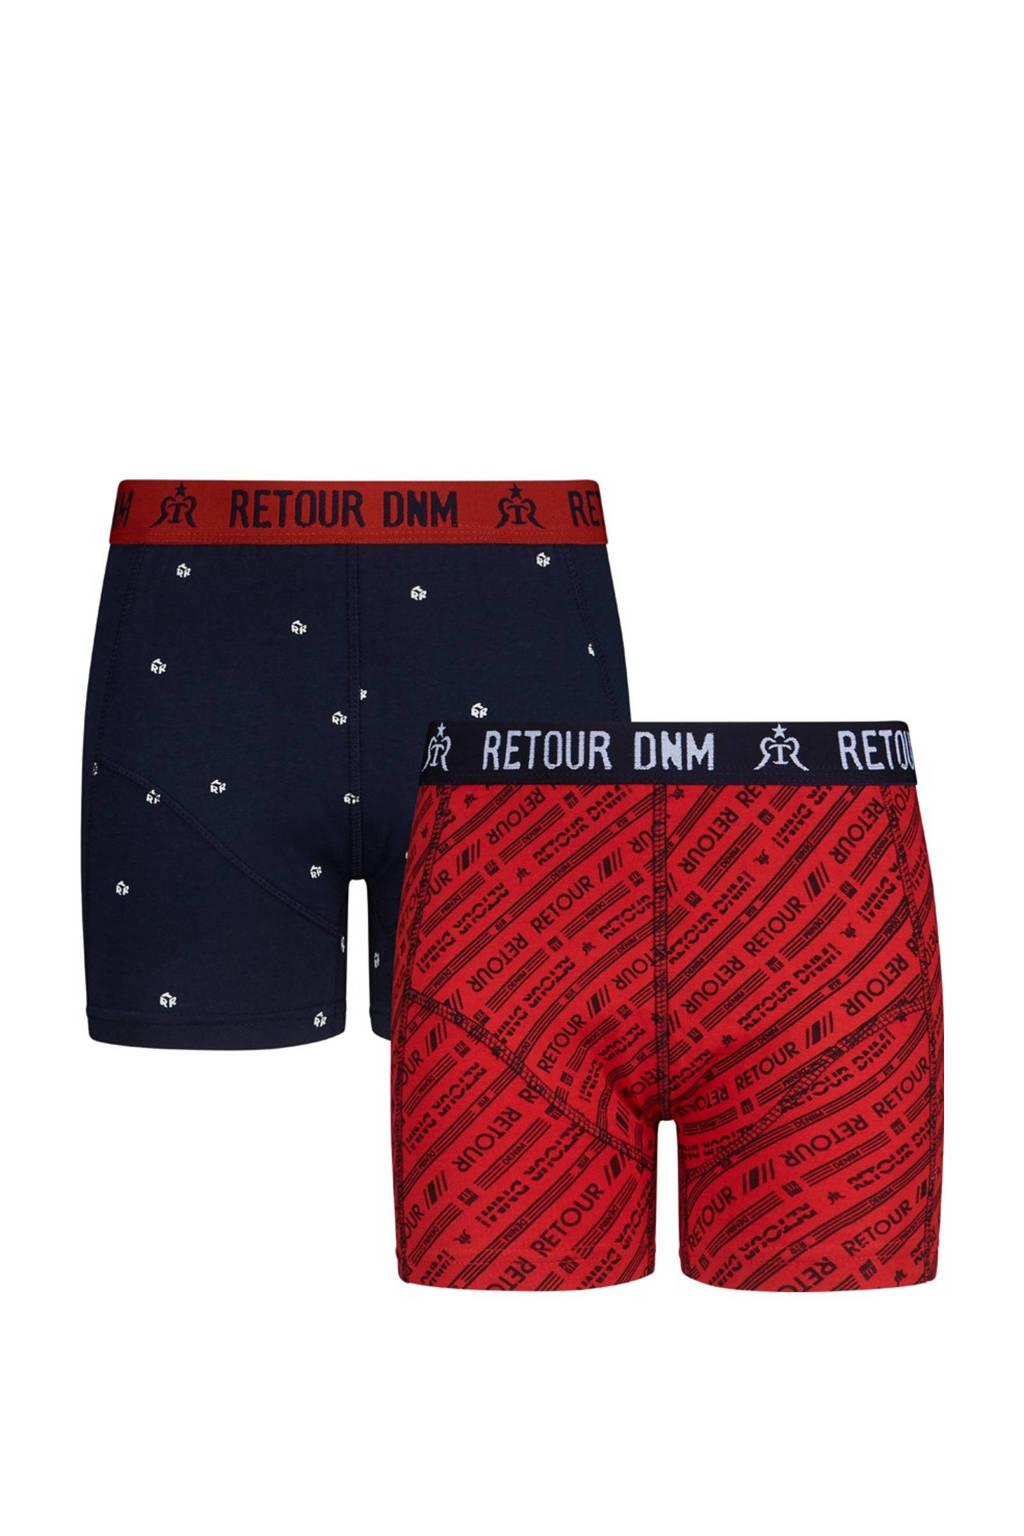 Retour Denim   boxershort Bjorn - set van 2 donkerblauw/rood, Donkerblauw/rood